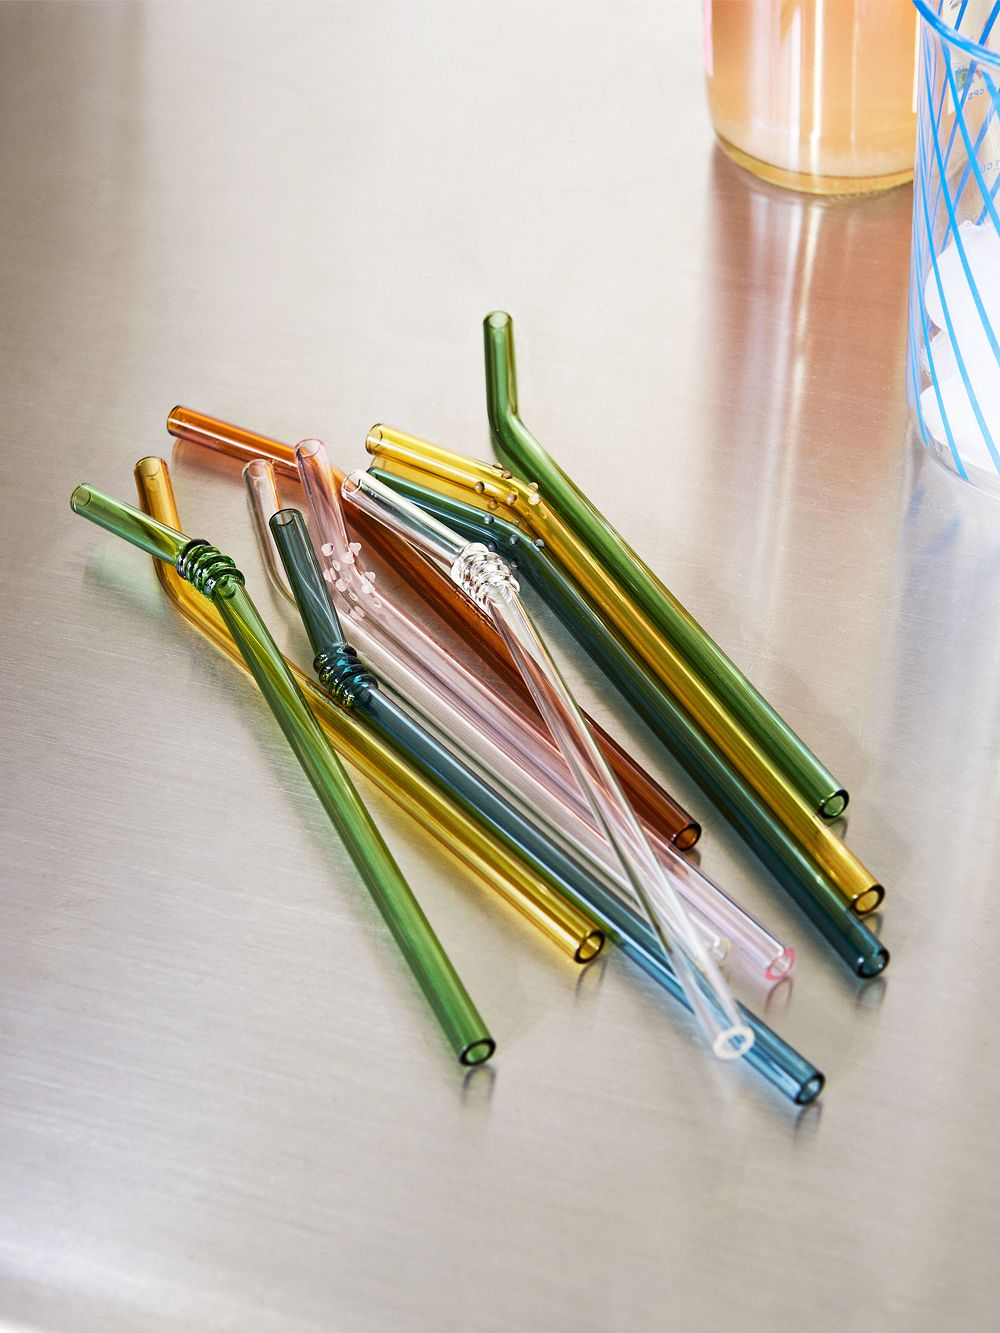 Hay Sip glass straws